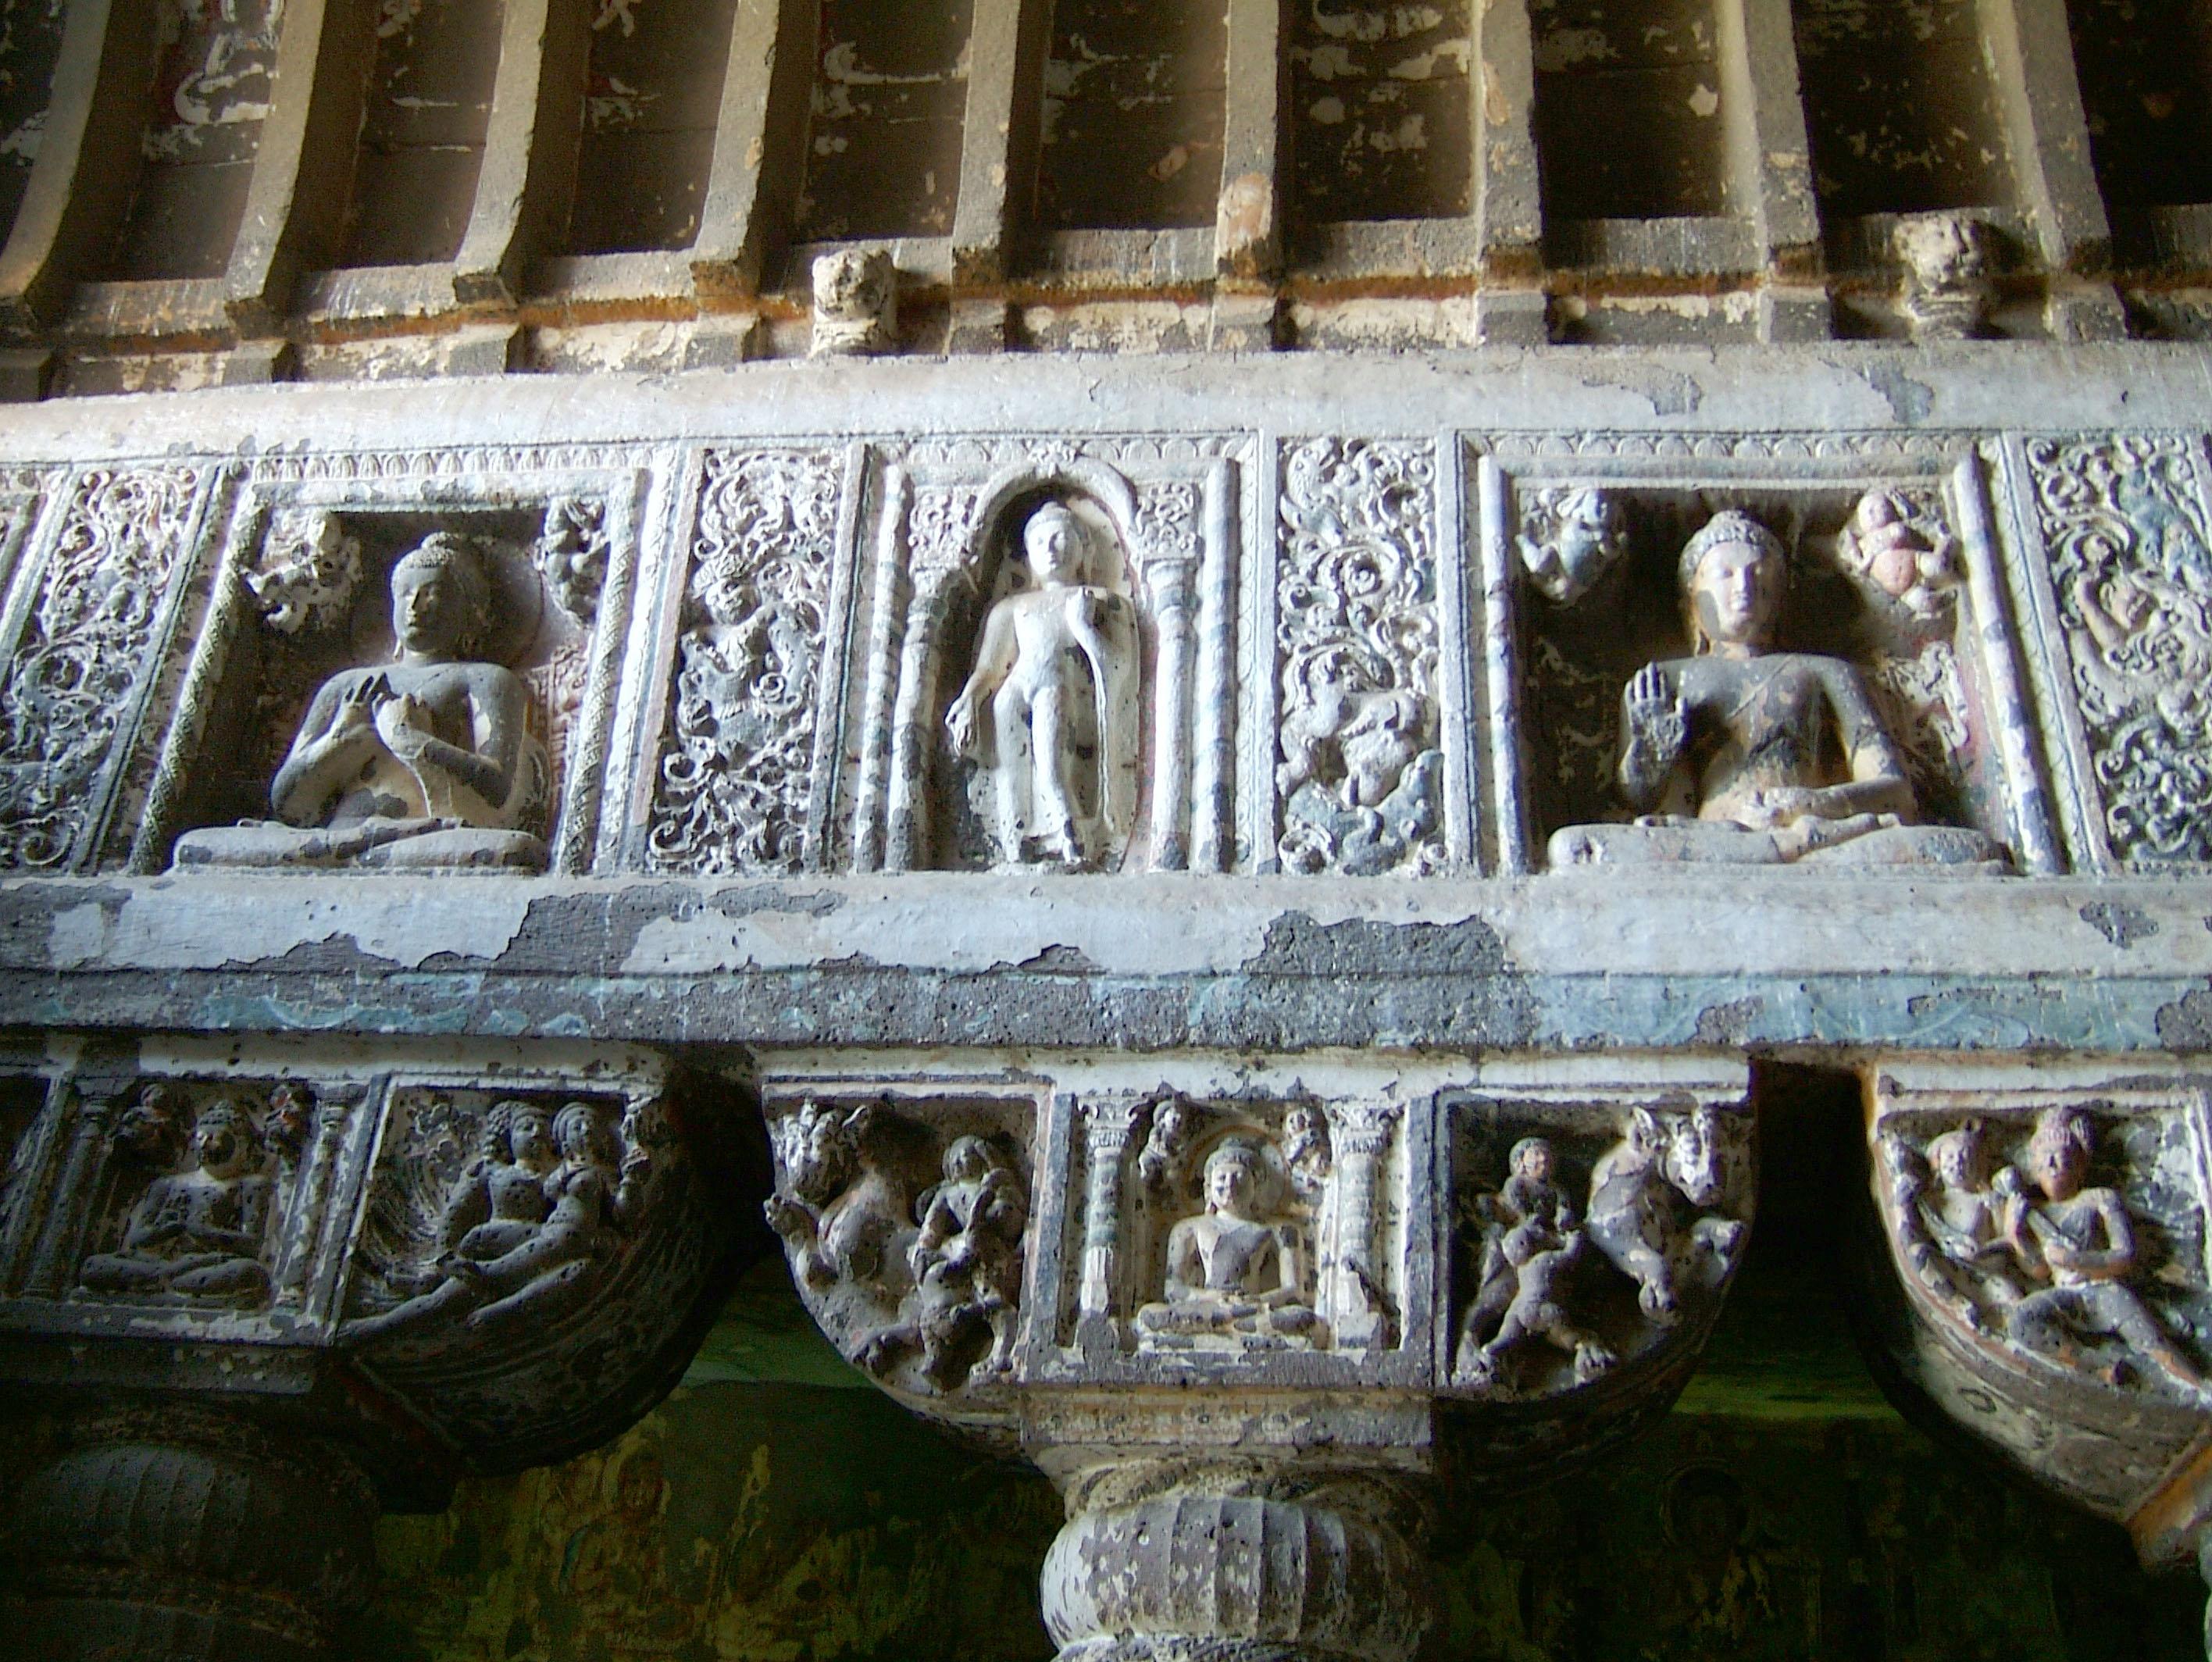 Marathwada Ajanta Caves Buddha carvings India Apr 2004 05